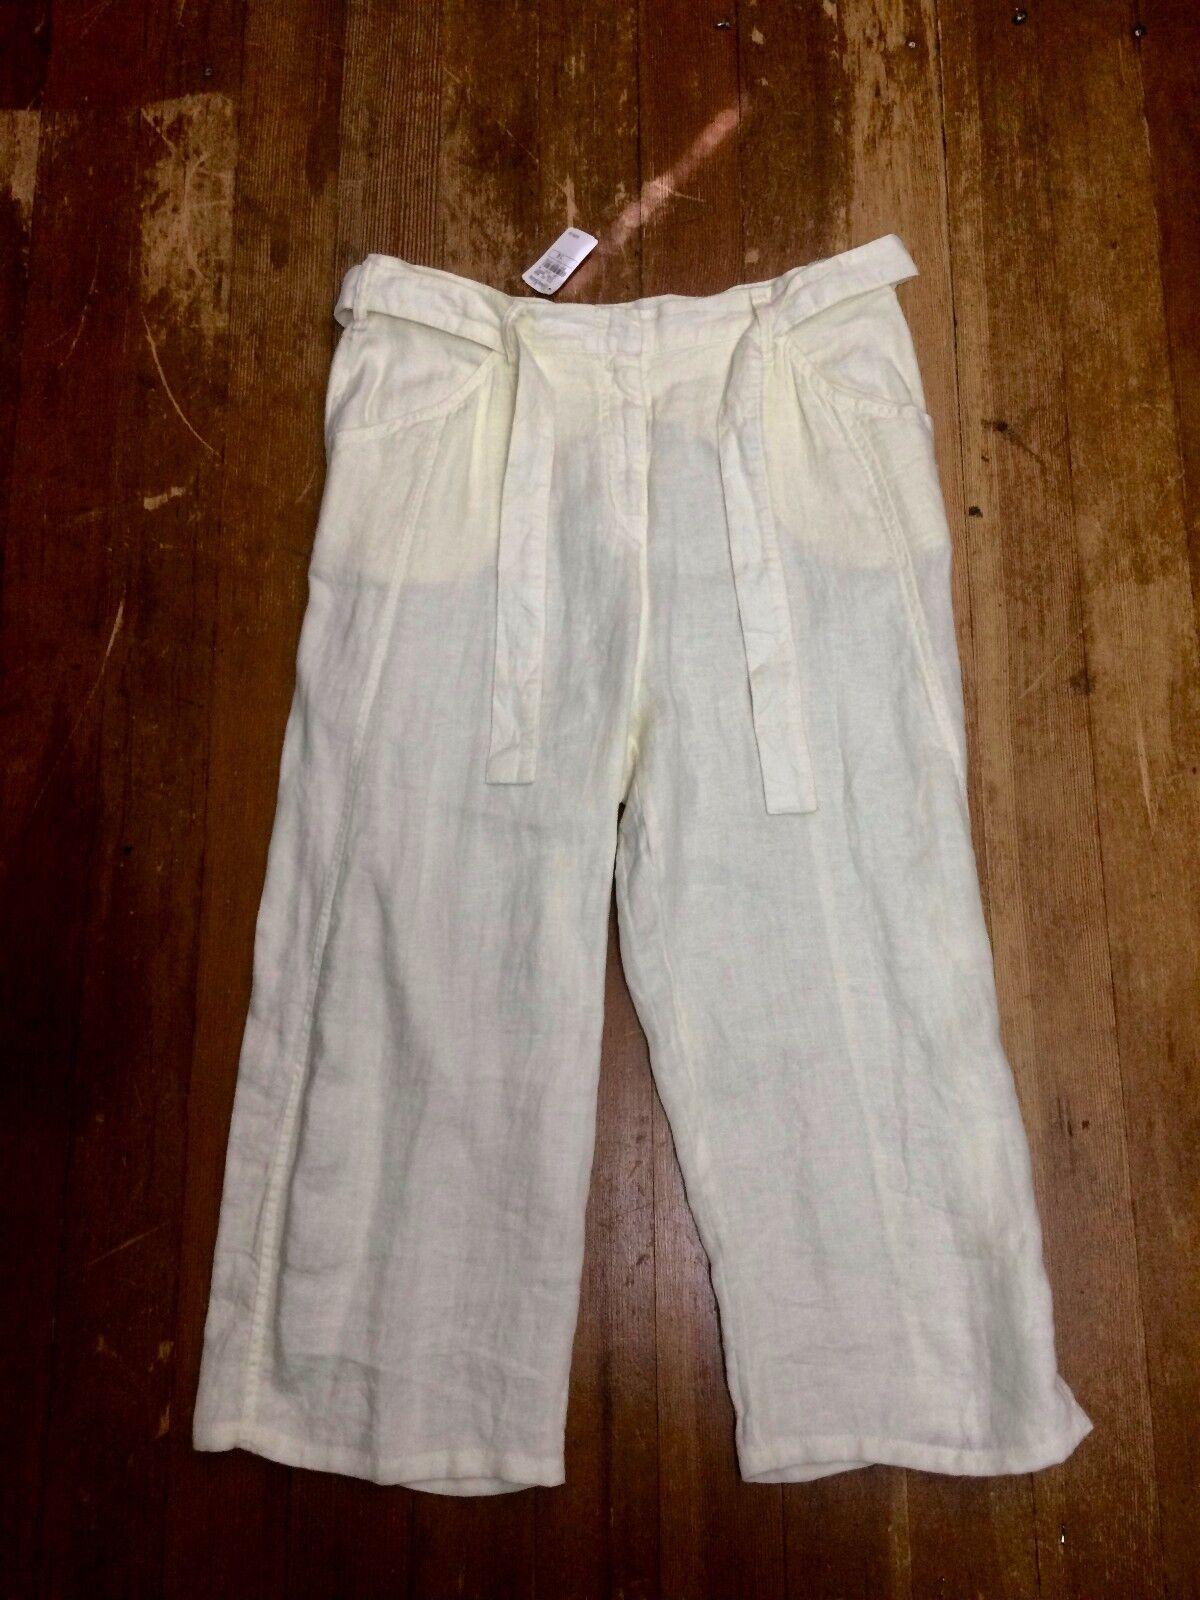 NWT  395 Giorgio Armani 14 Cream Linen Capri Pants Trousers Slacks Neiman Marcus